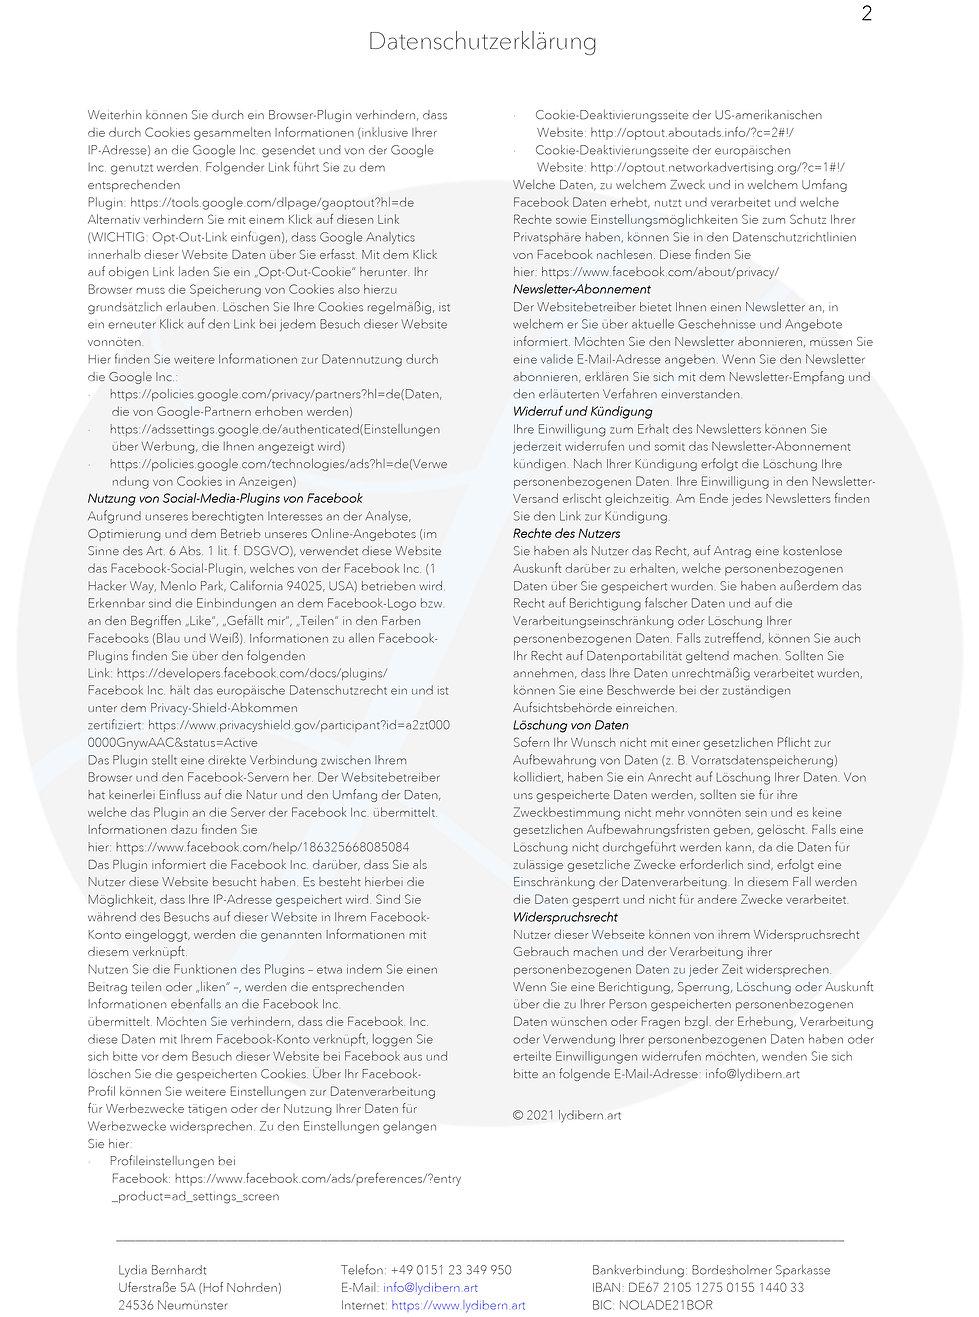 Datenschutzerklärung-2.jpg